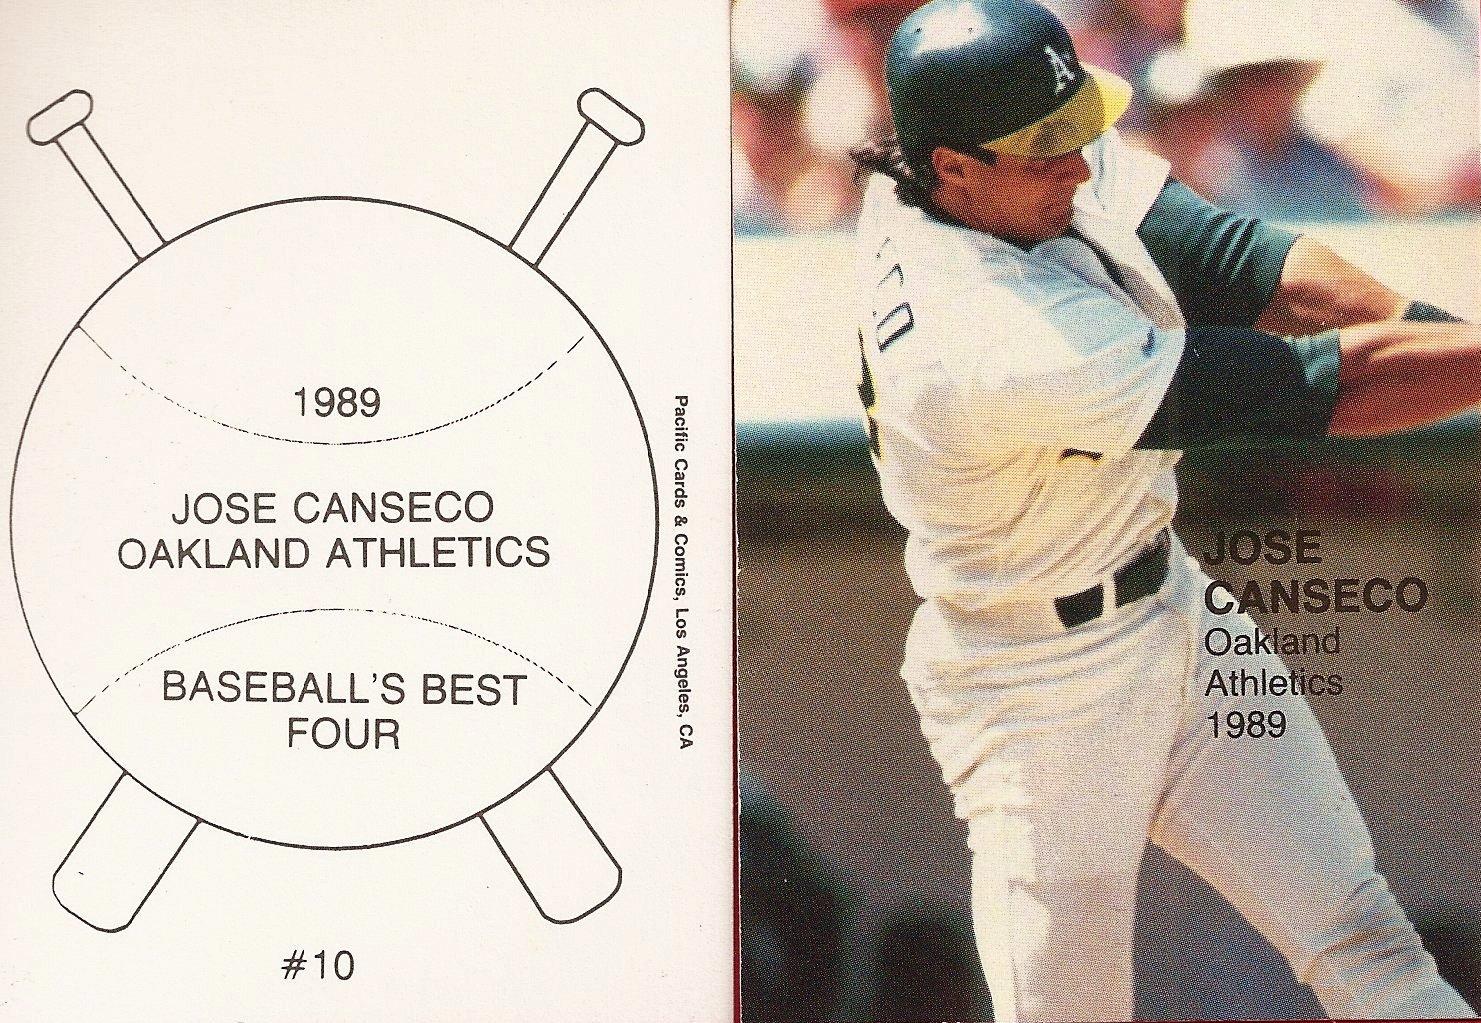 1989 Pacific Cards & Comics Baseballs Best Four